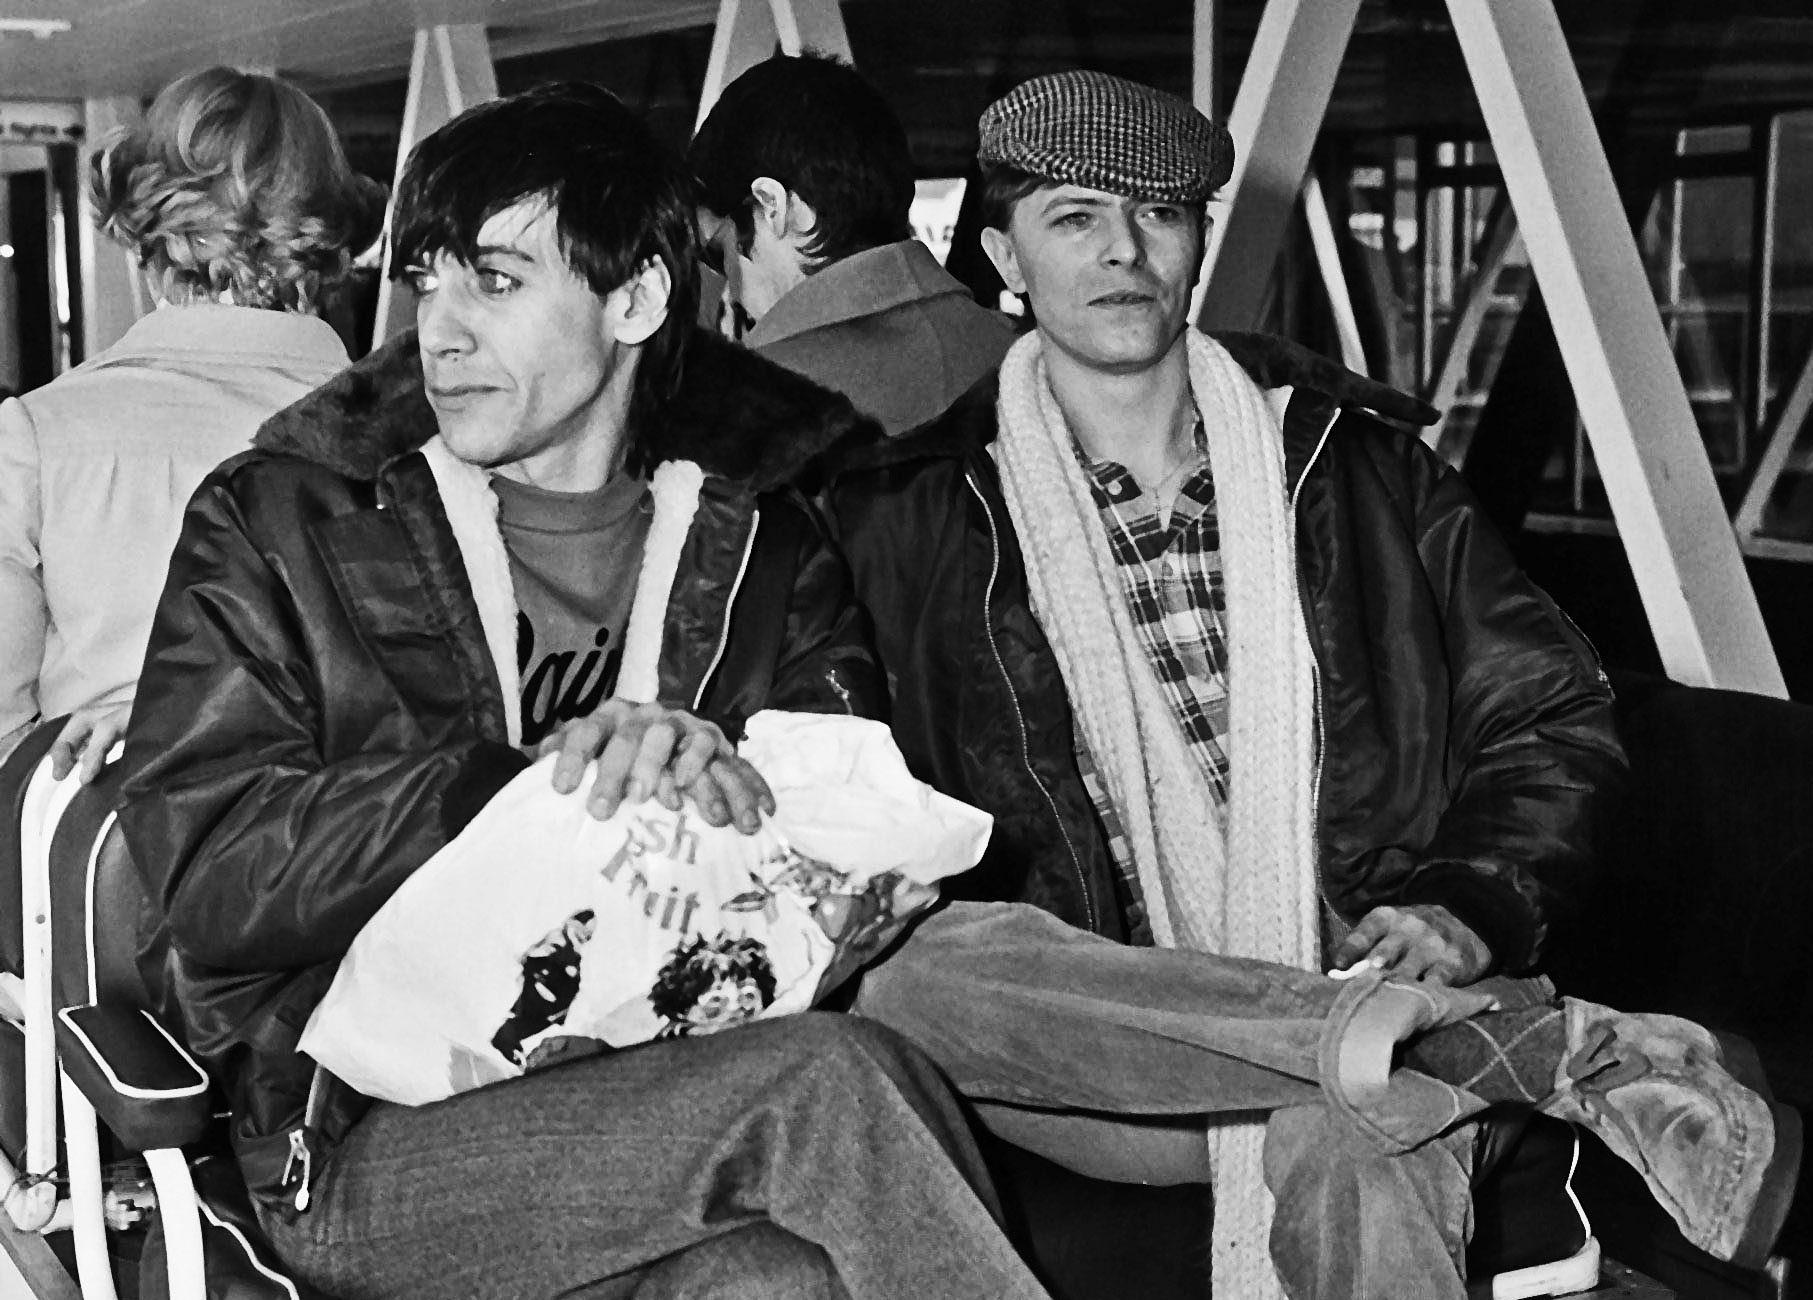 Iggy Pop Remembers David Bowie: 'He Appreciated Oddballs' - Rolling Stone